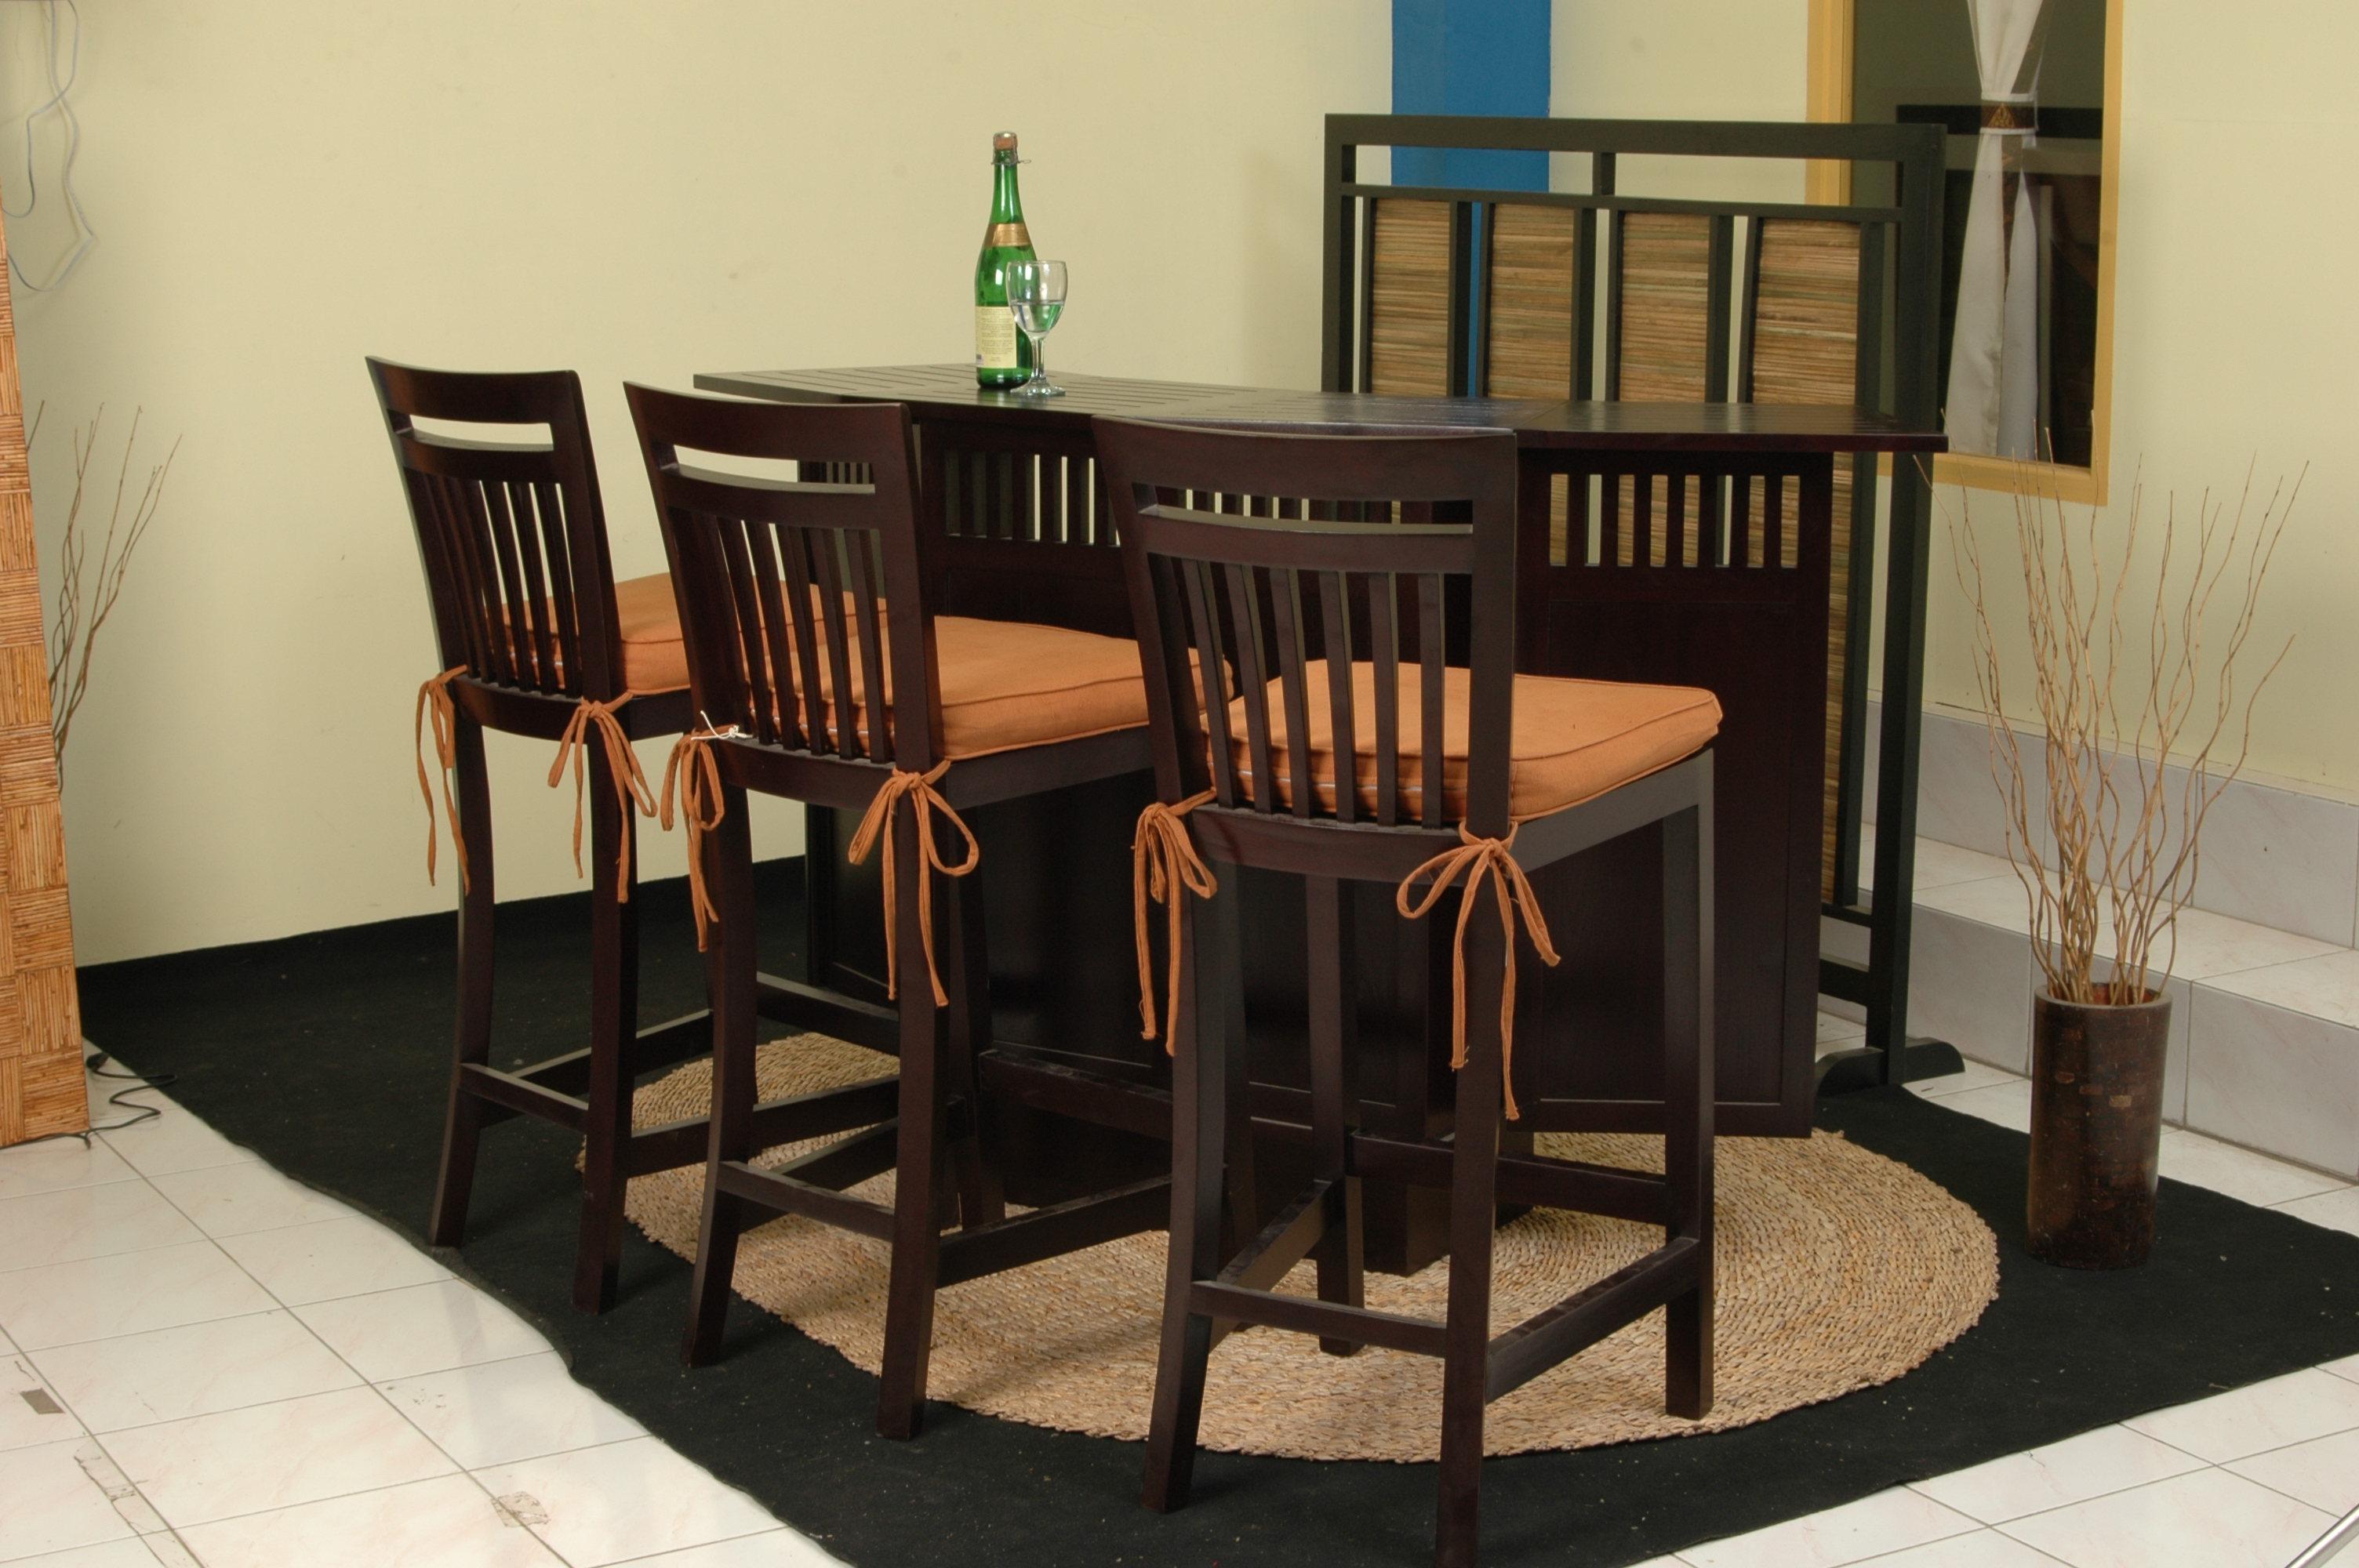 Bar Height Glass Table, Mexican Bar Table Set Indonesia Garden Teak Outdoor Furniture